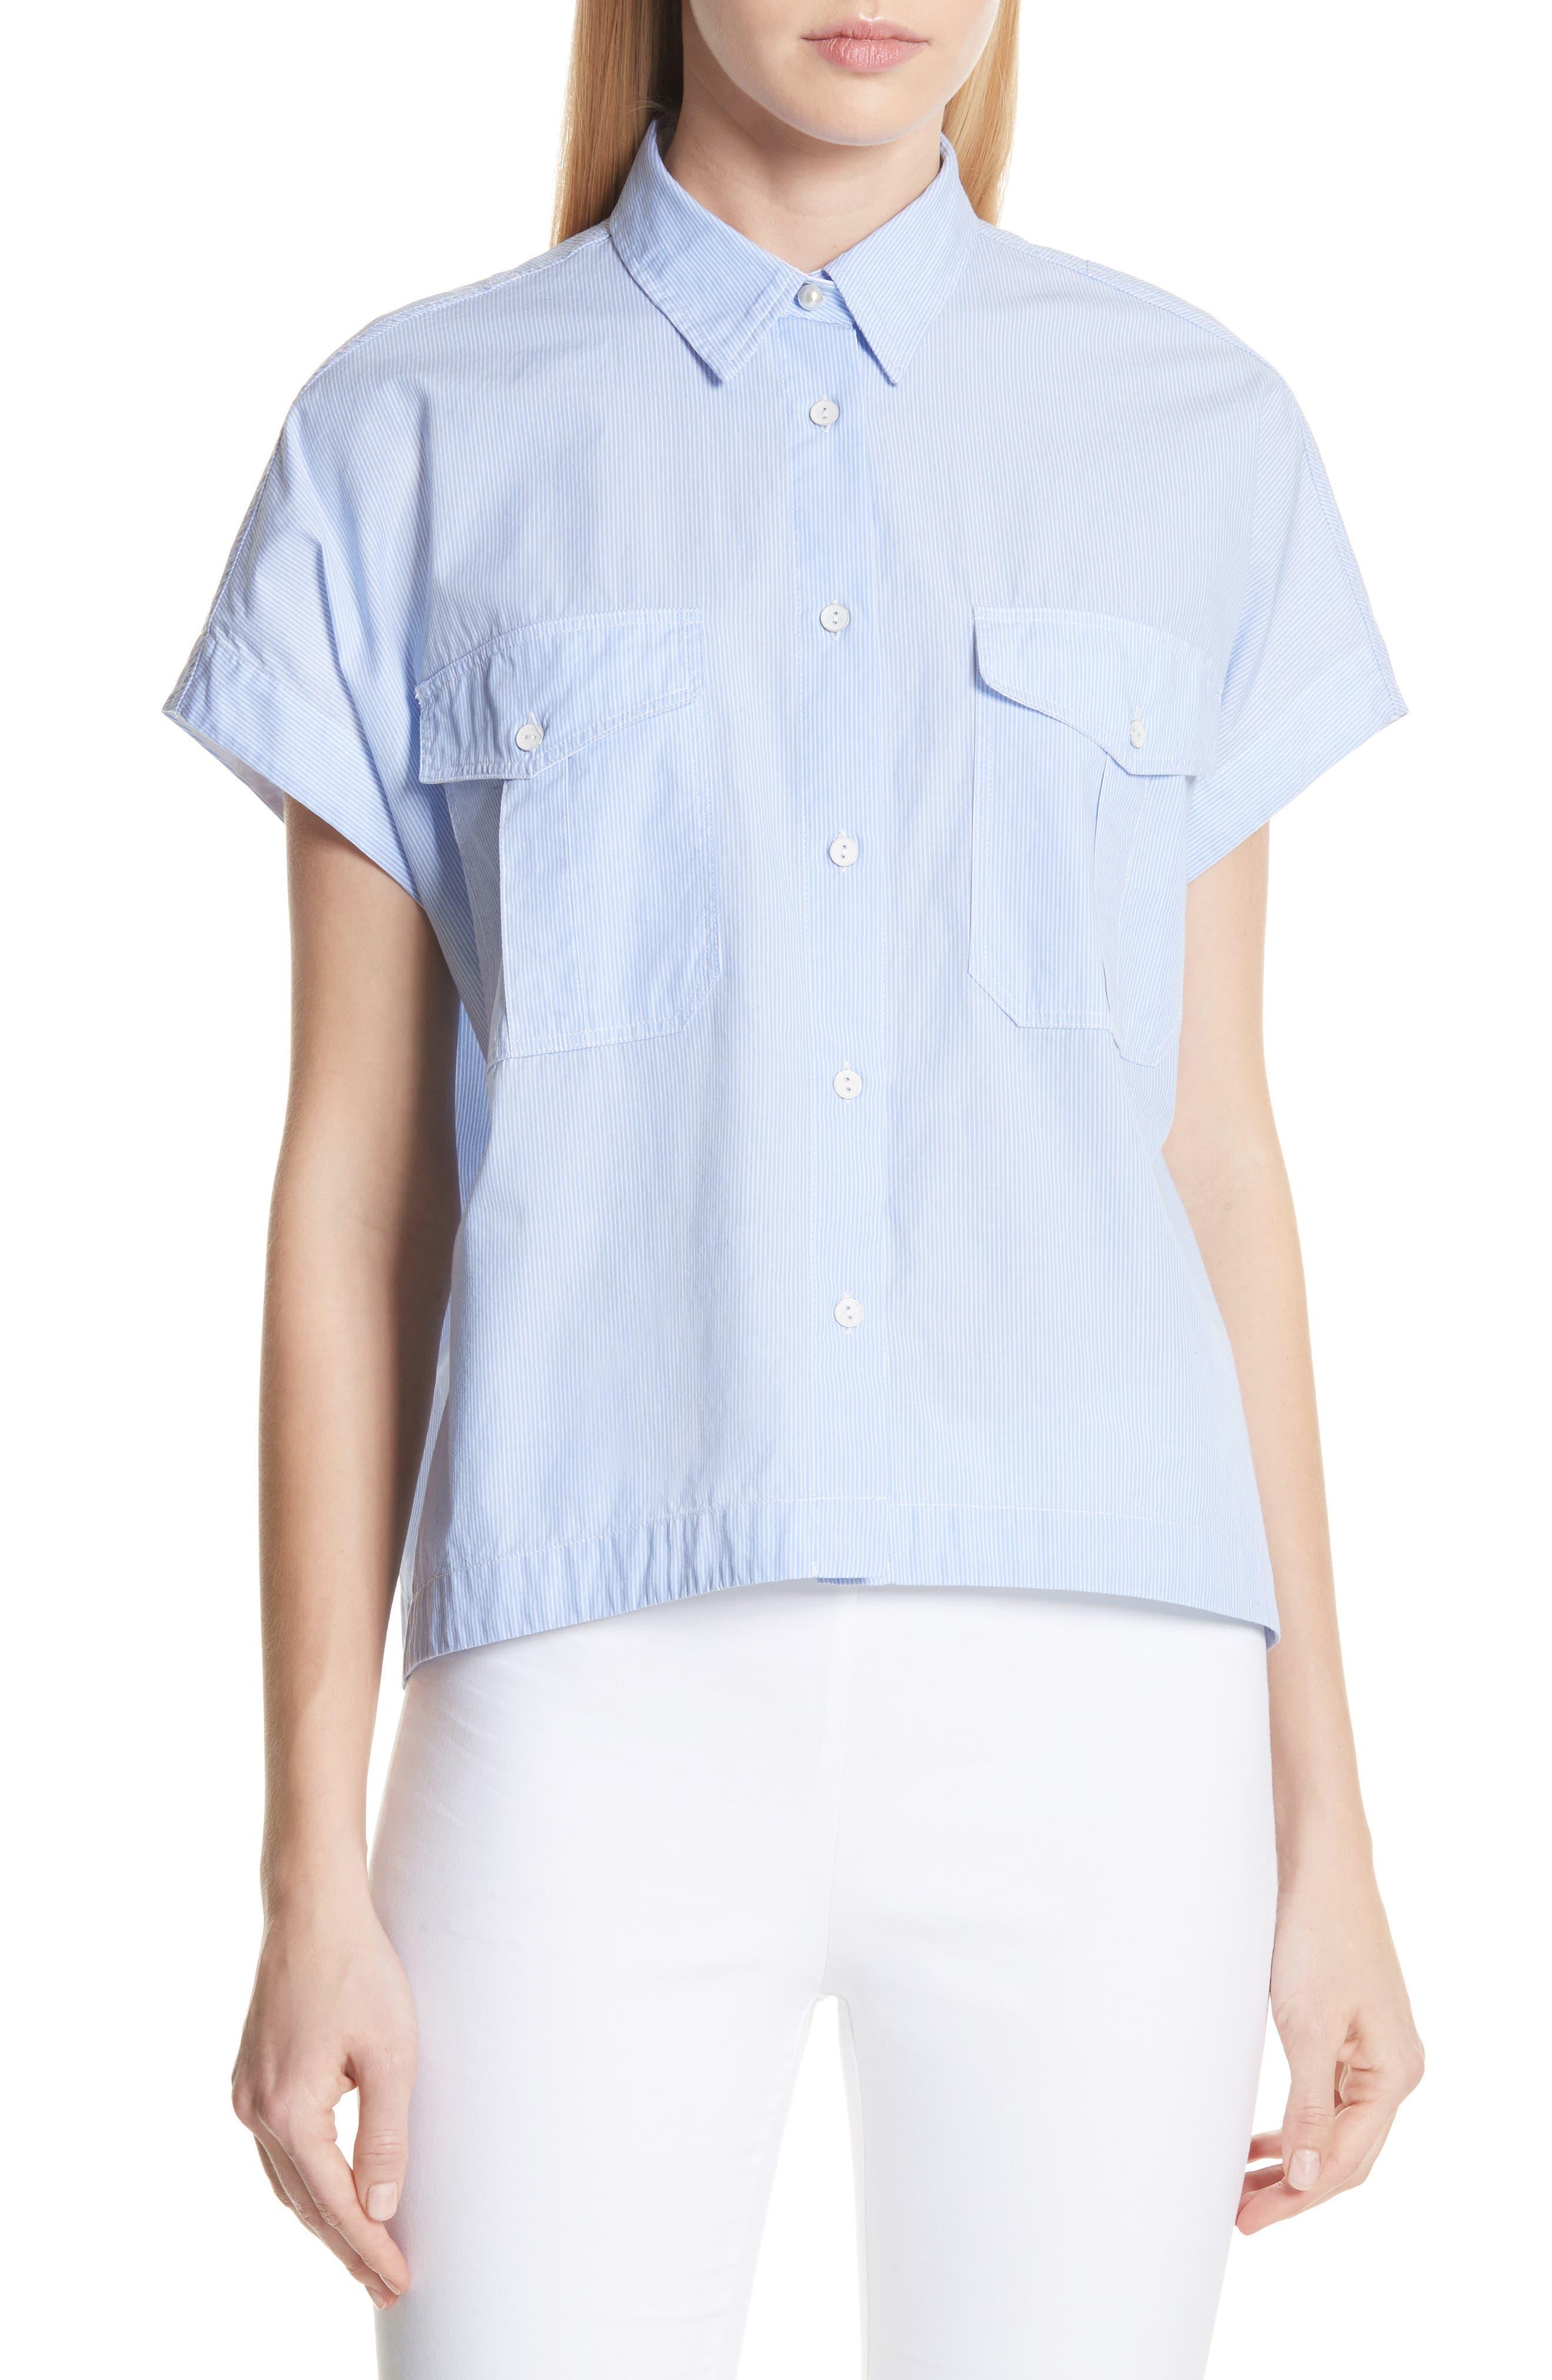 Pearson Shirt,                         Main,                         color,